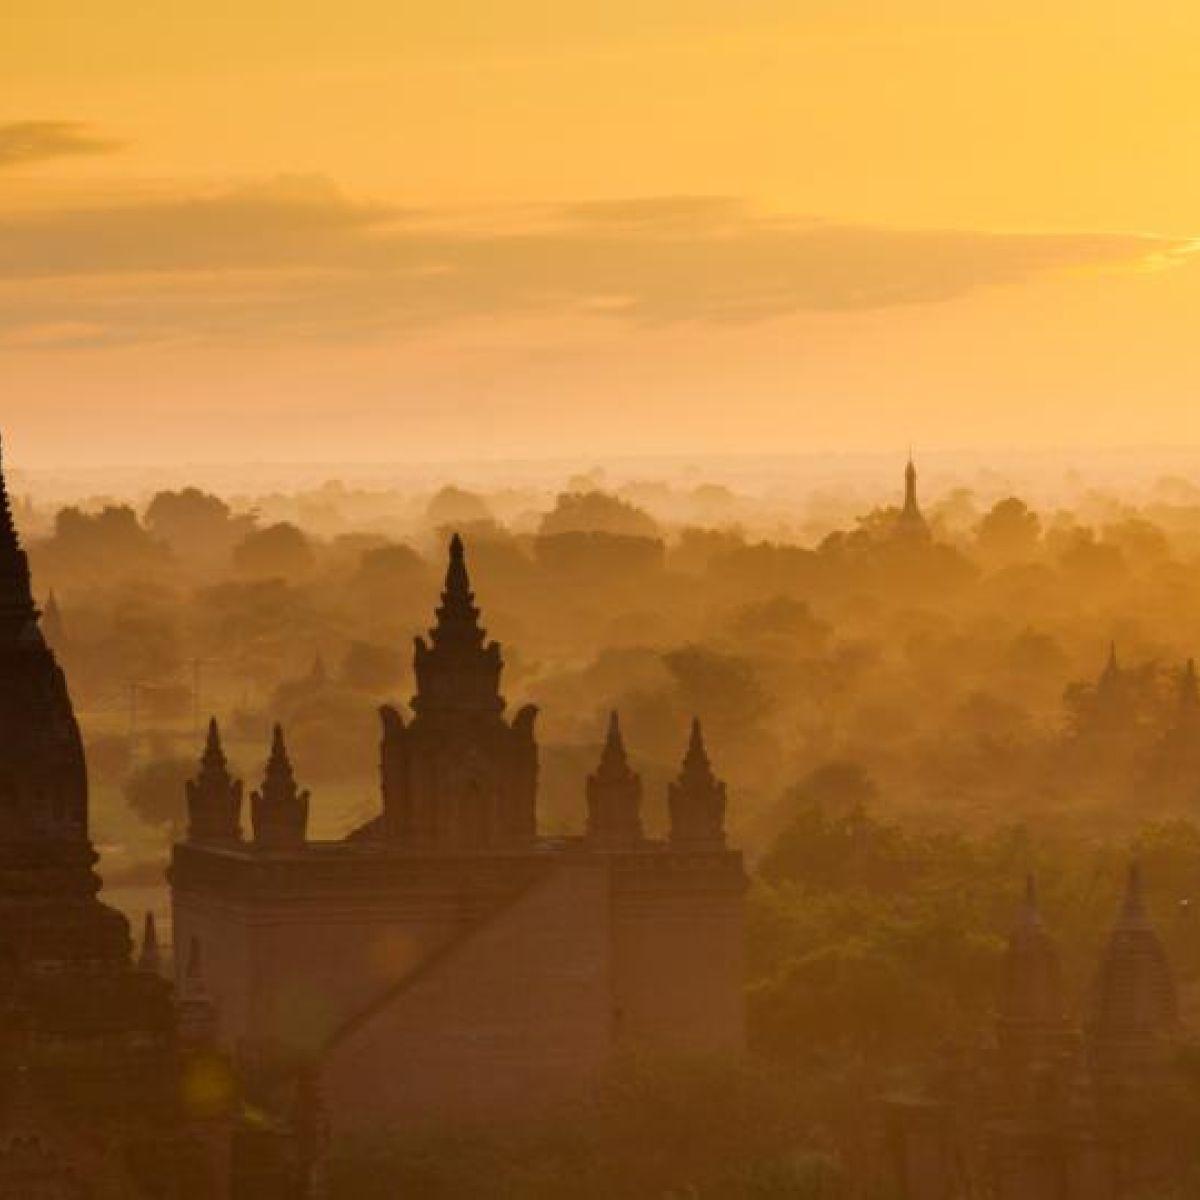 Dawn of a new era in Burma as global firms eye telecom licences